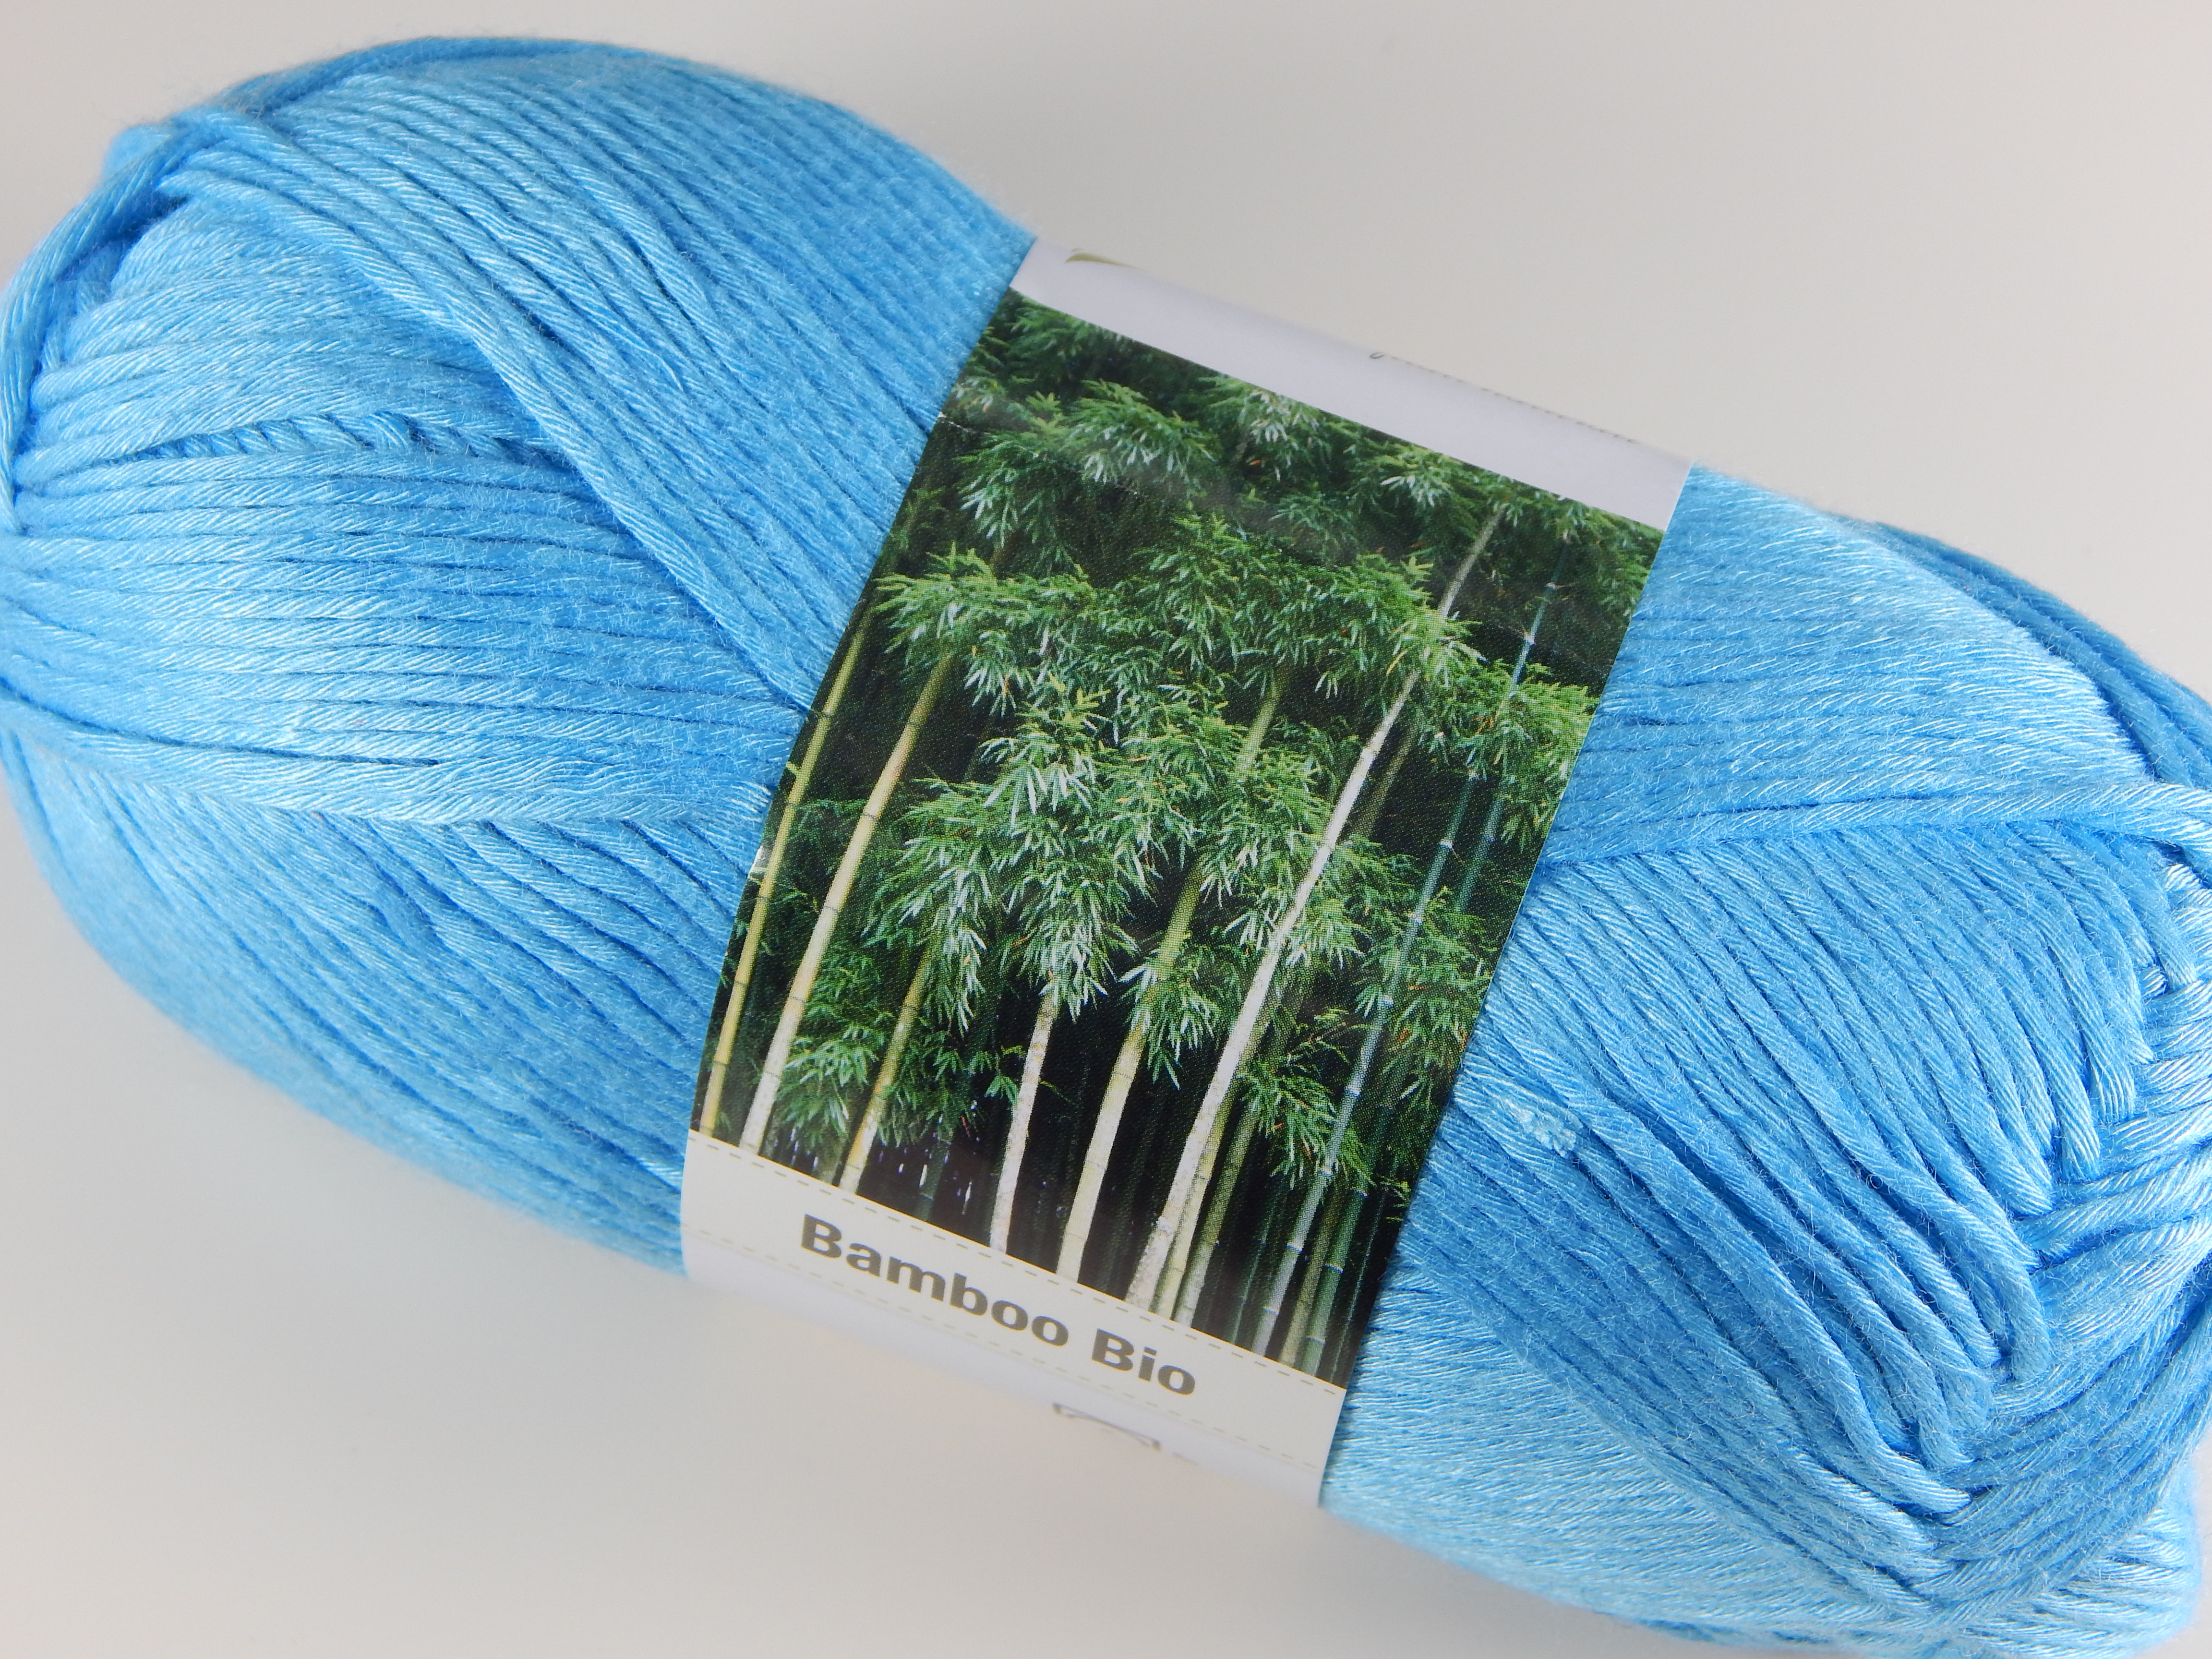 PASCUALI Bio Bamboo Weiches Naturgarn aus Bambus-Zellstoff, 100g ...